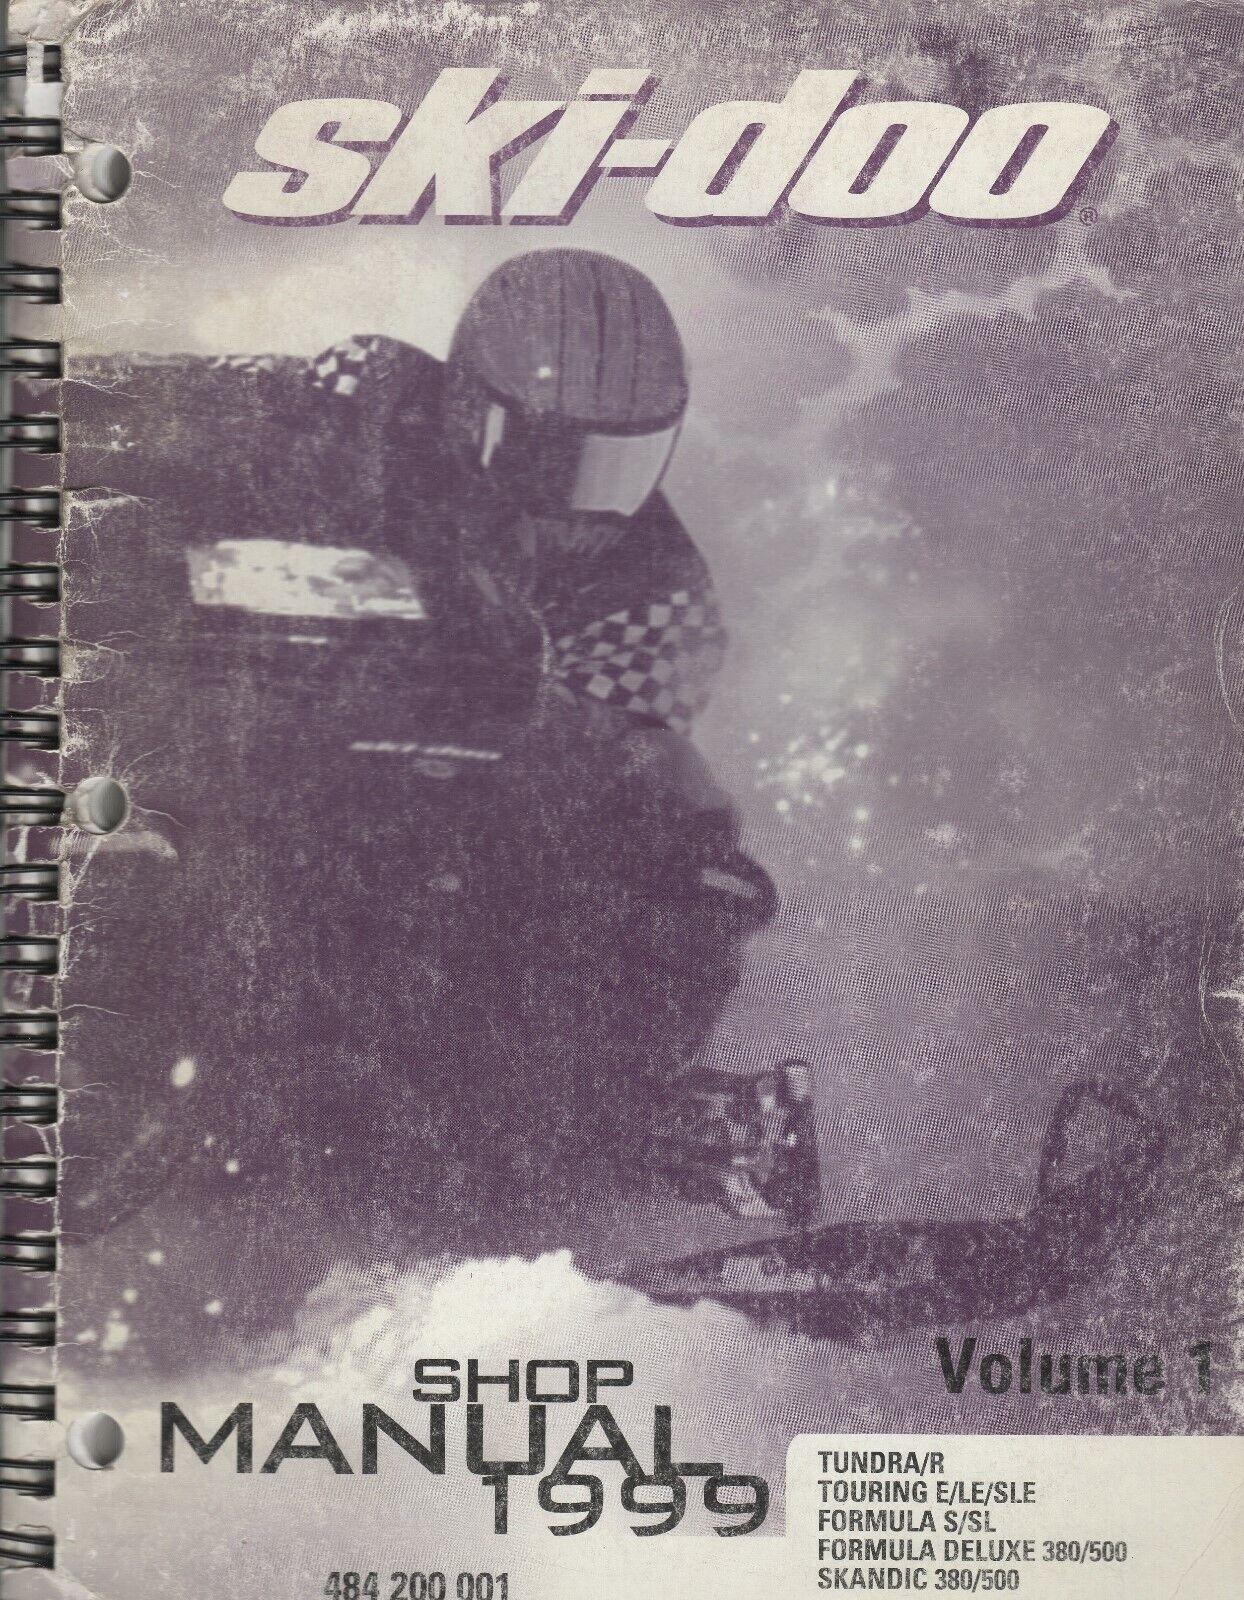 1999 SKI-DOO SNOWMOBILE SHOP MANUAL VOLUME 1 SERIES, P N 484 200 001 (660)